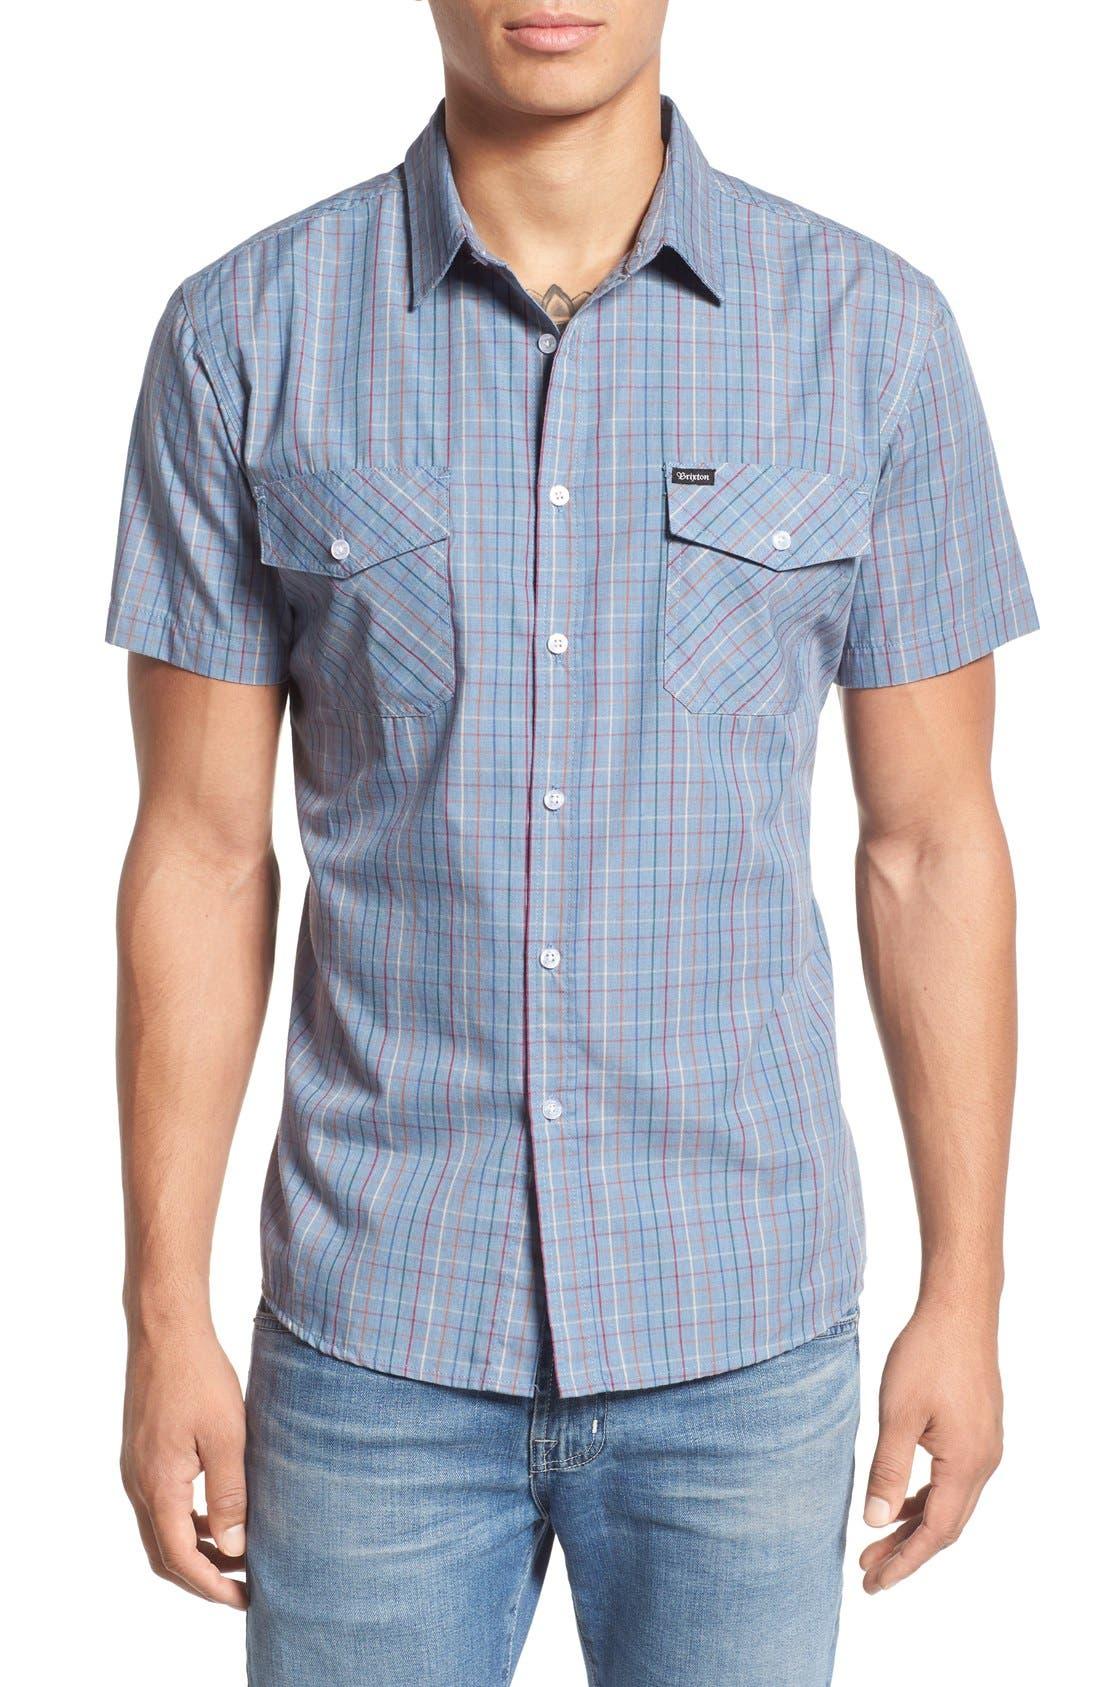 Main Image - Brixton 'Memphis' Trim Fit Plaid Short Sleeve Woven Shirt